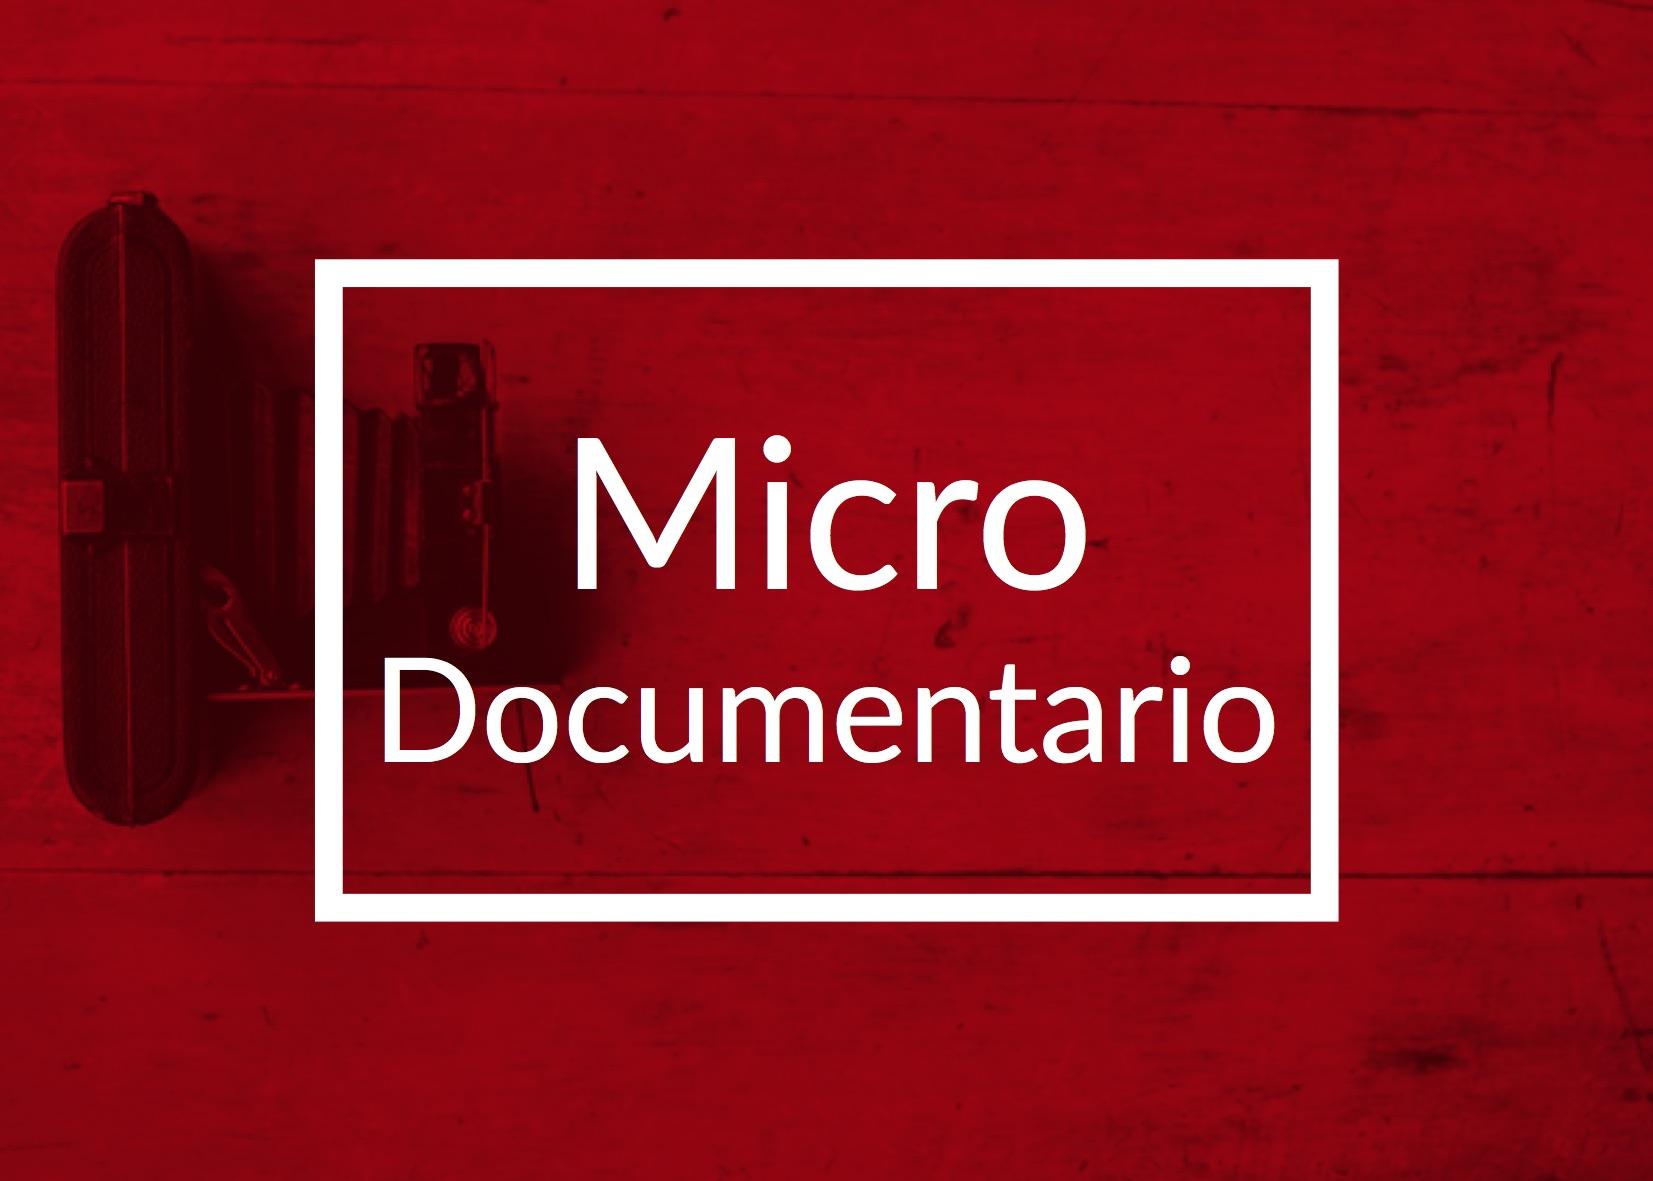 Micro Documentario